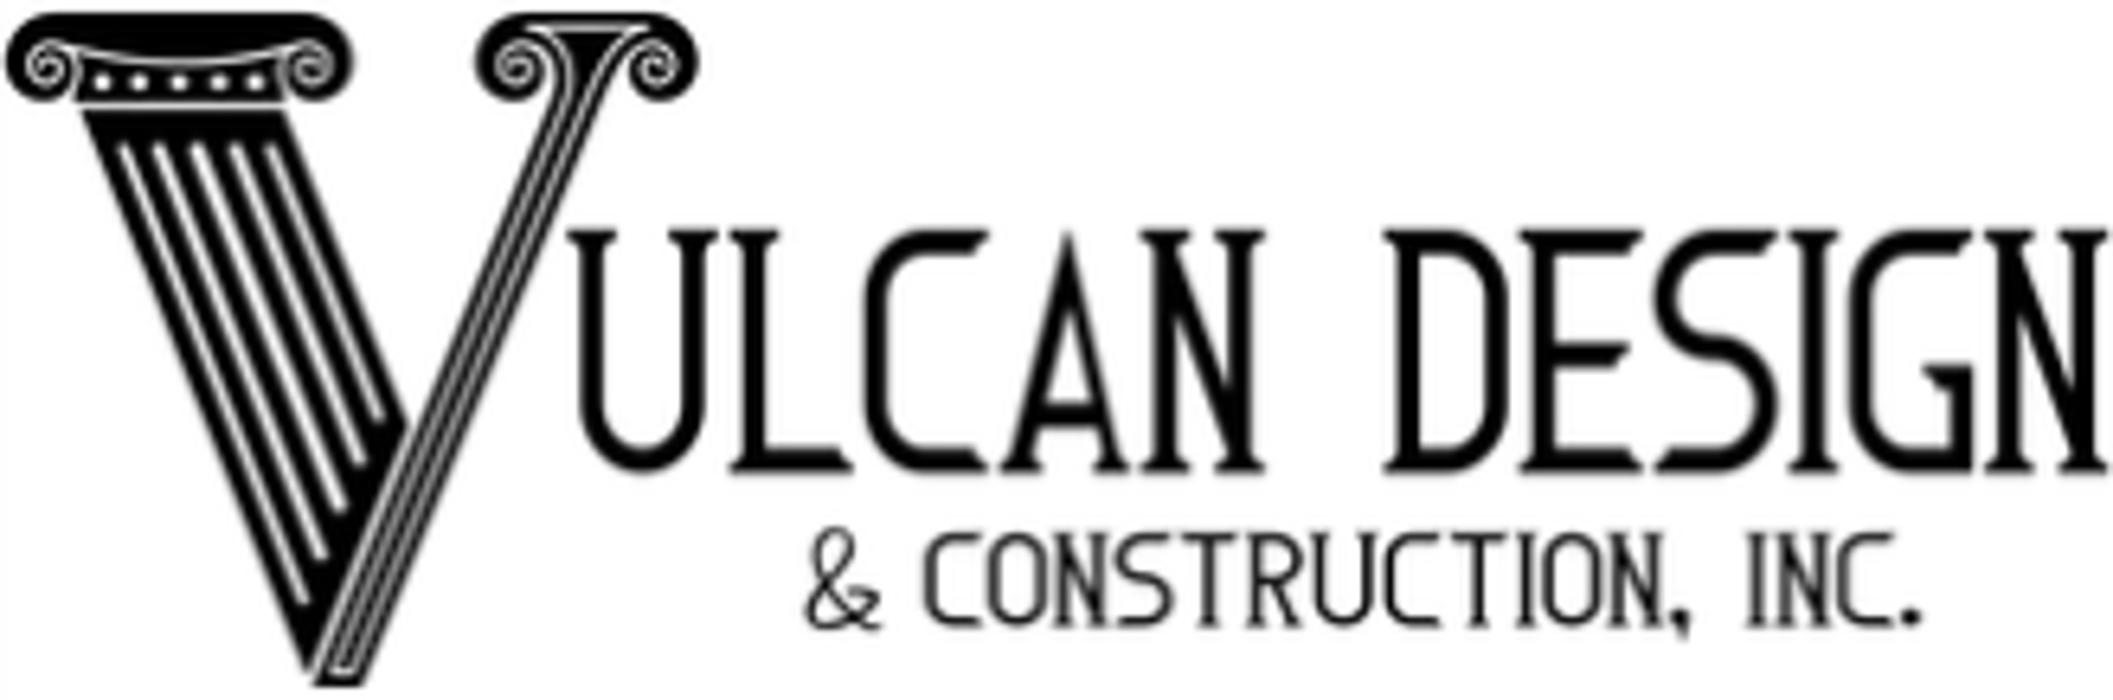 Vulcan Design & Construction, Inc. - Vancouver, WA